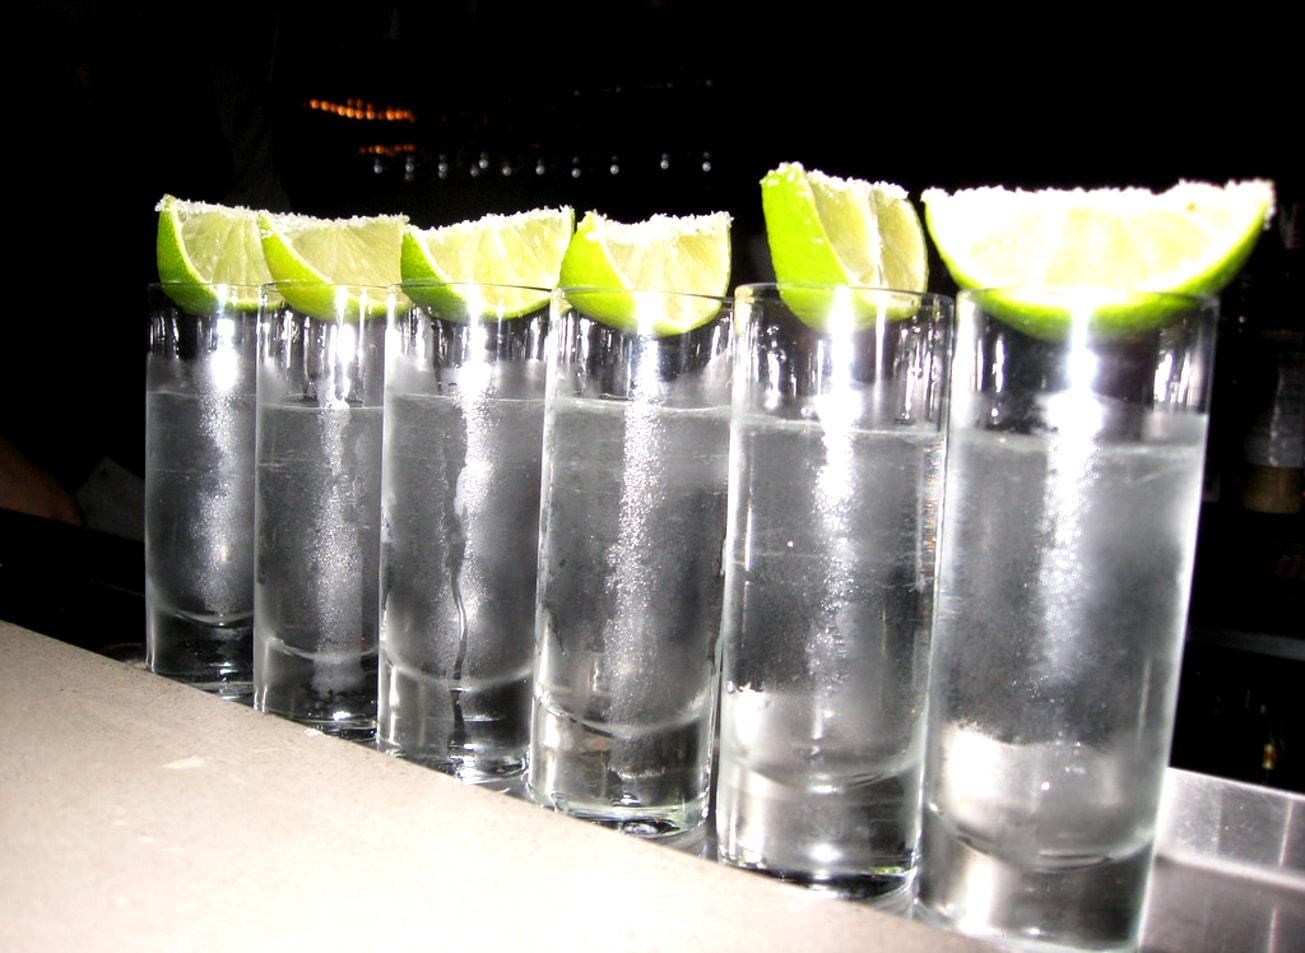 dégustation de vodka cracovie activites vimigo